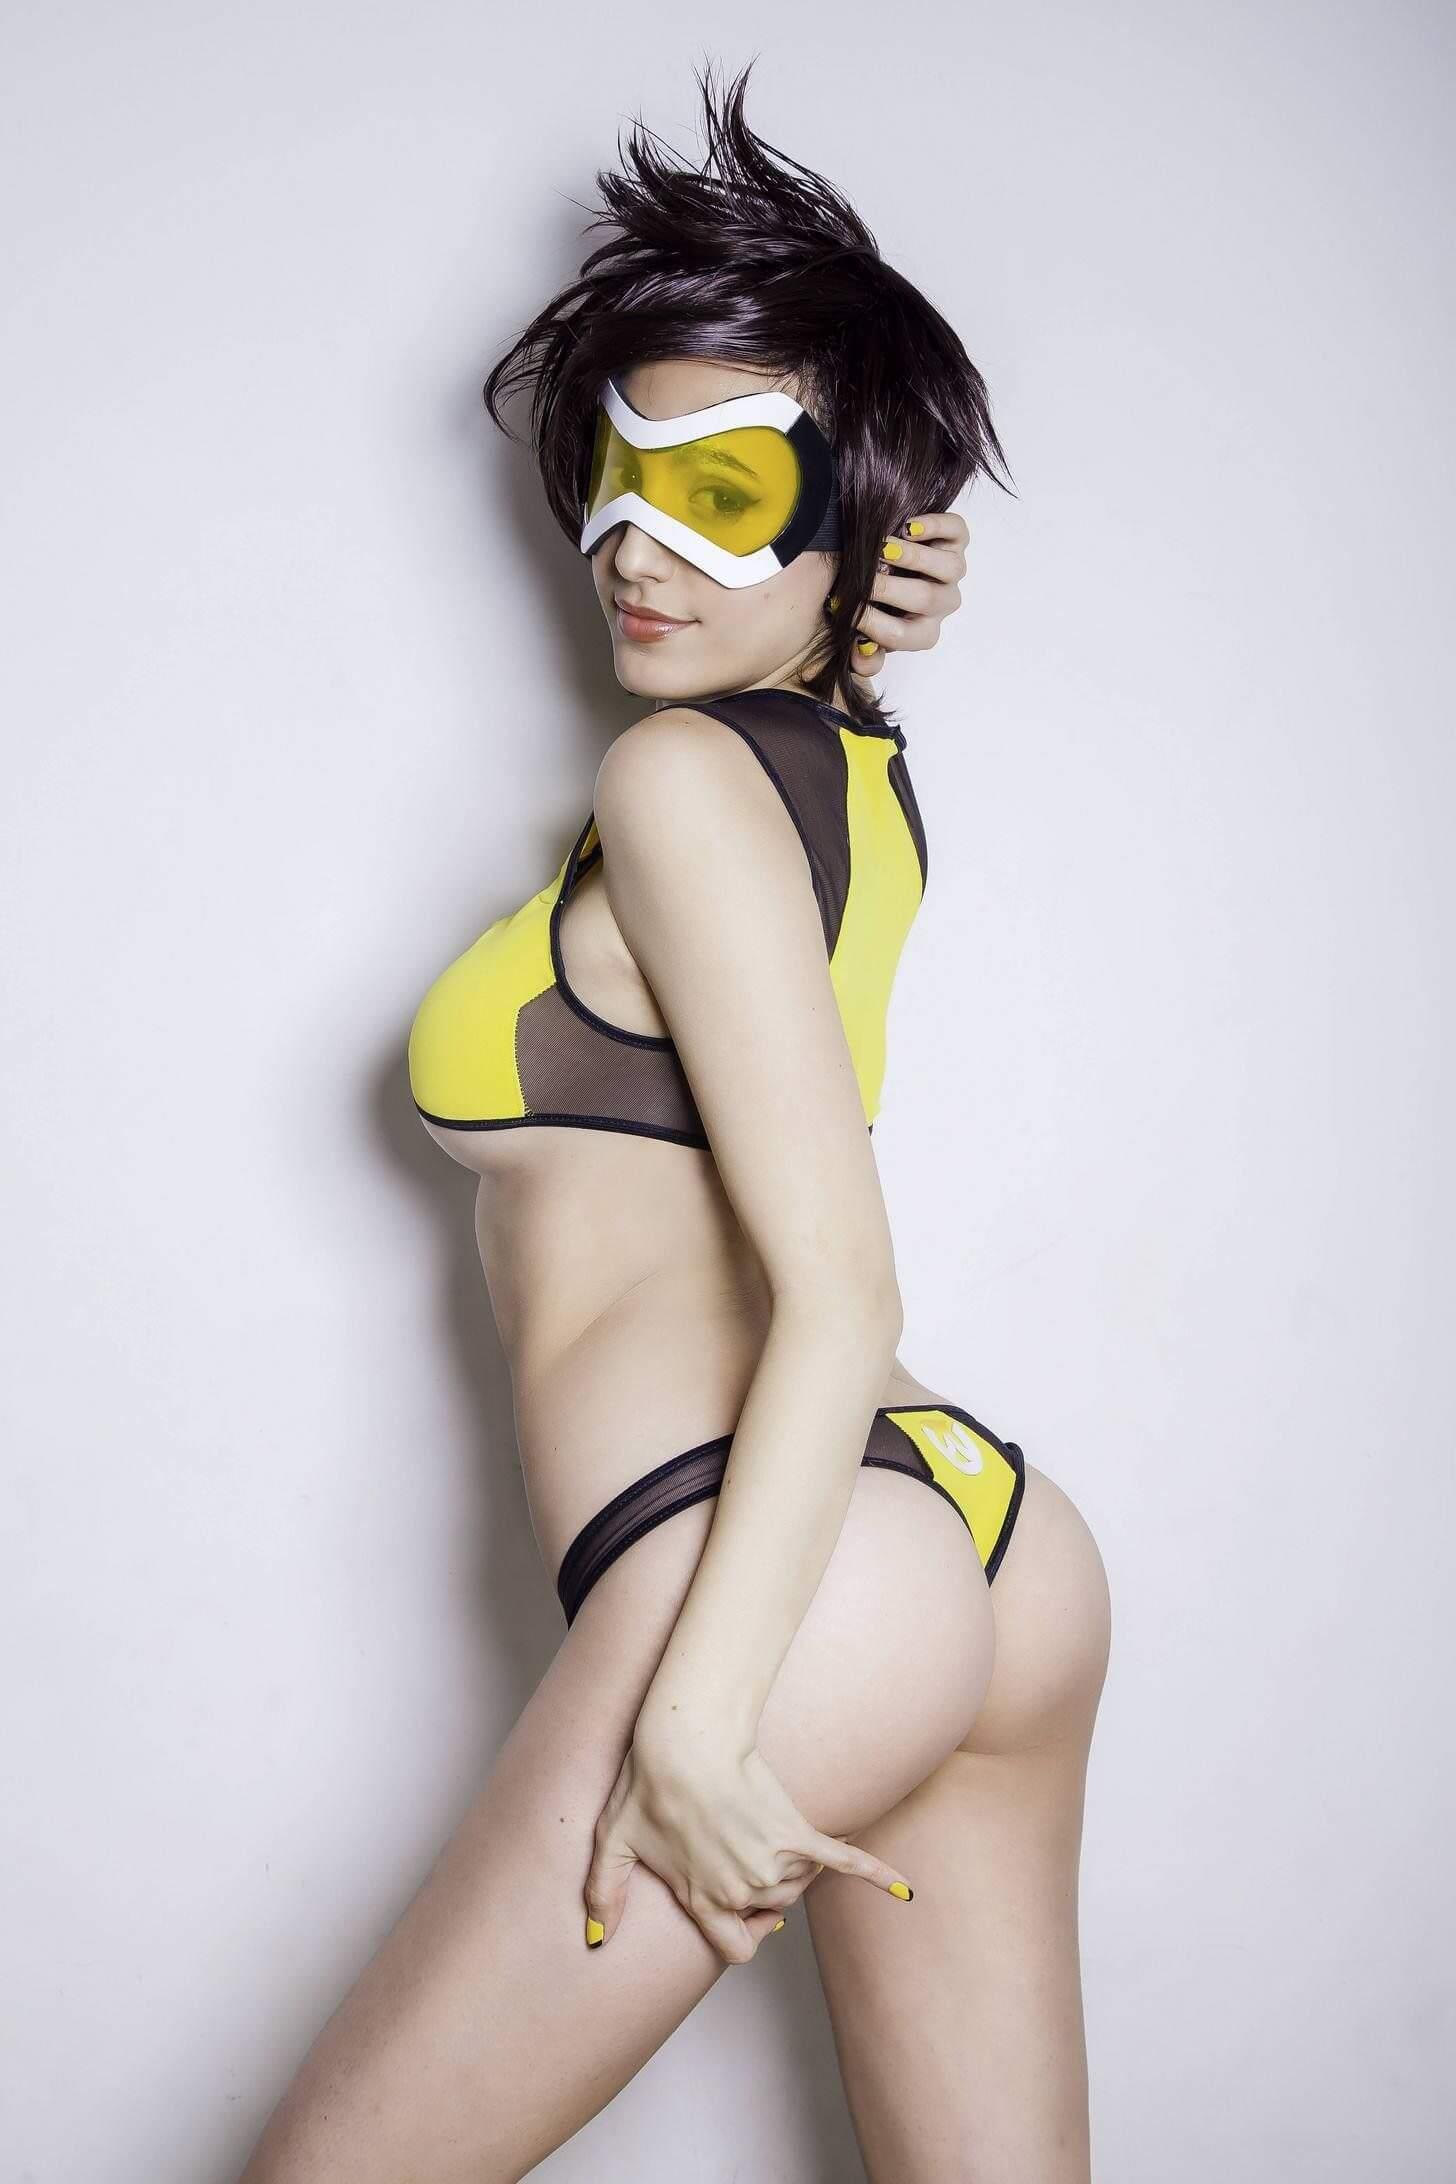 Tracer hot butt pics